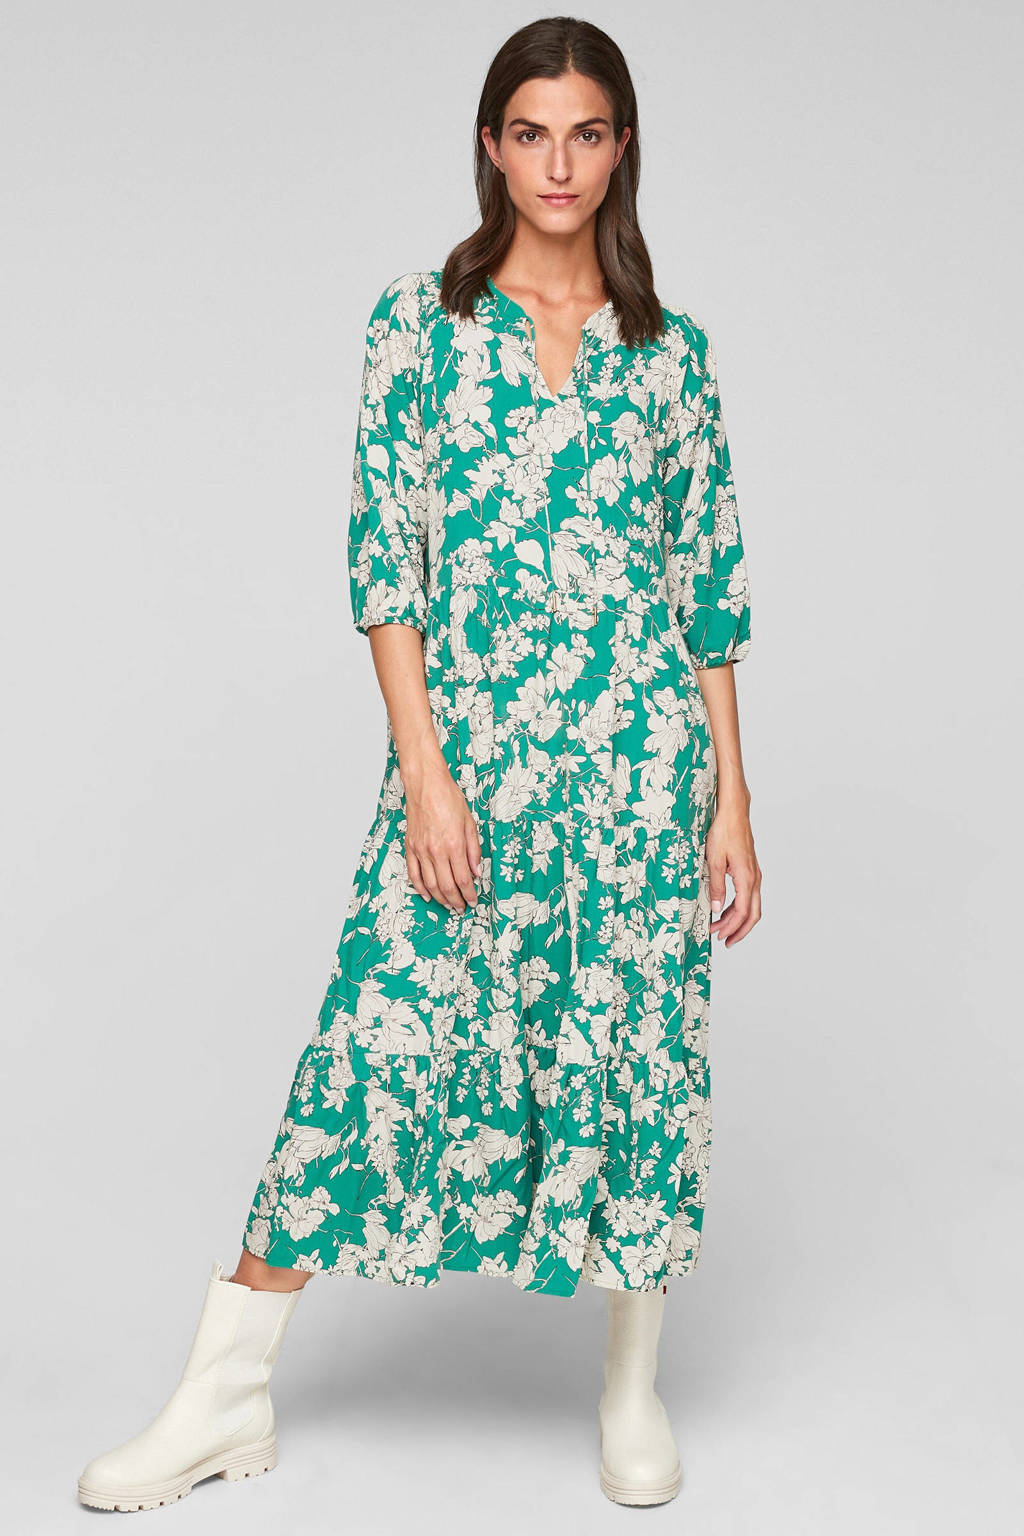 s.Oliver gebloemde midi jurk in viscose turquoise/wit, Turquoise/wit